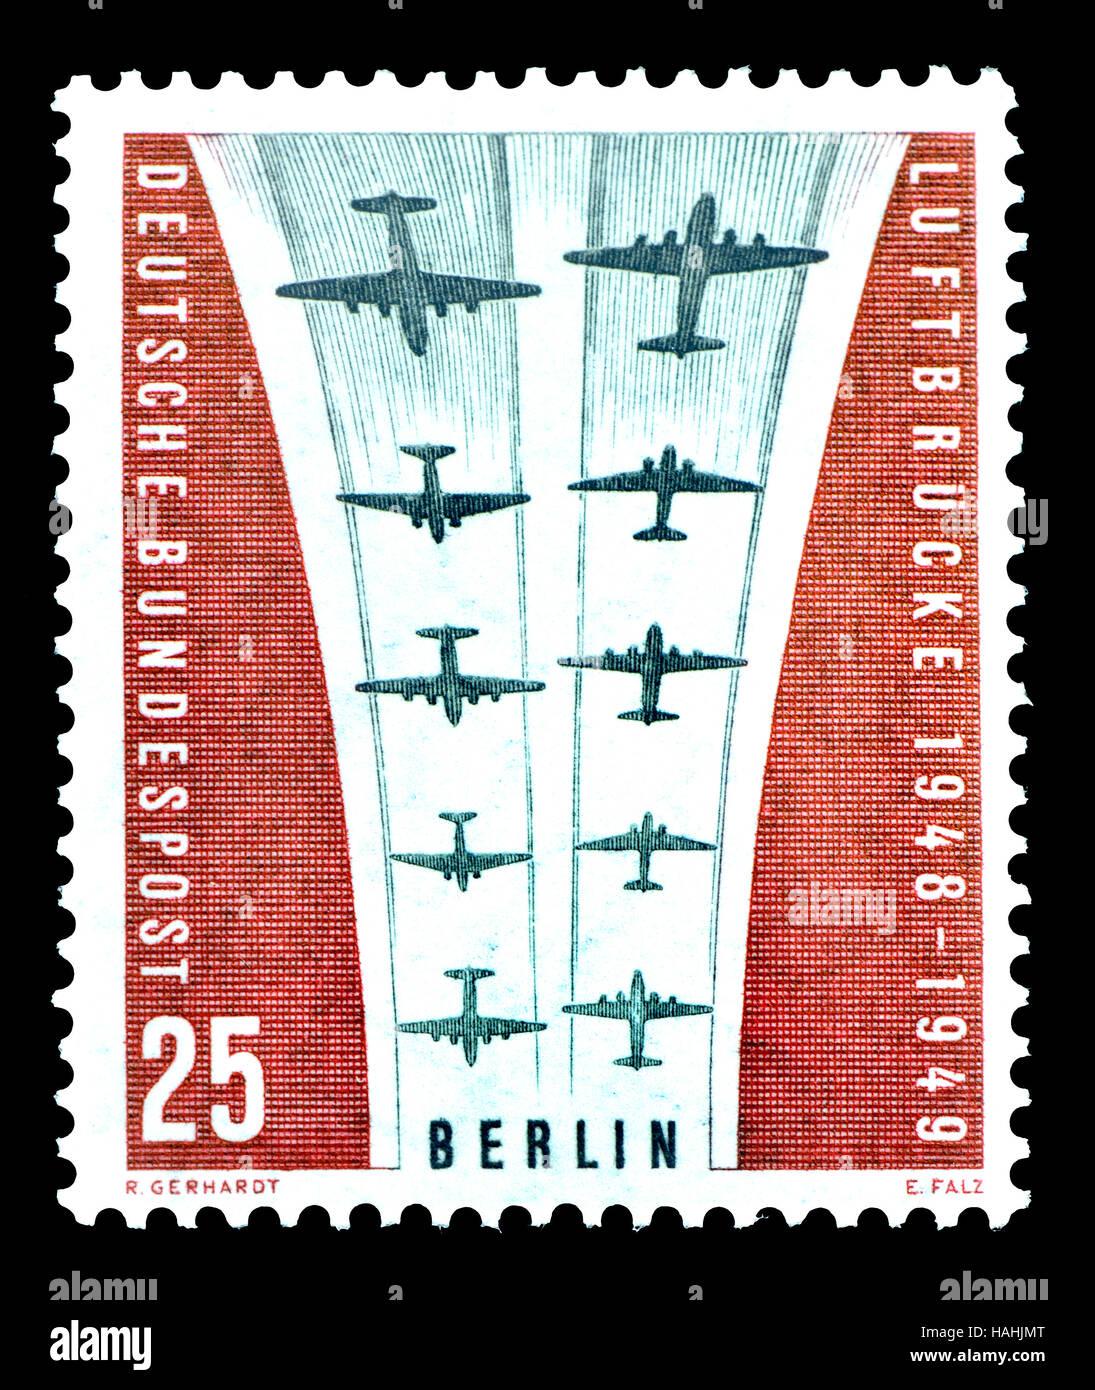 L'allemand (W) Berlin timbre-poste (1959): Pont Aérien de Berlin / Berliner Luftbrucke - le volant Photo Stock